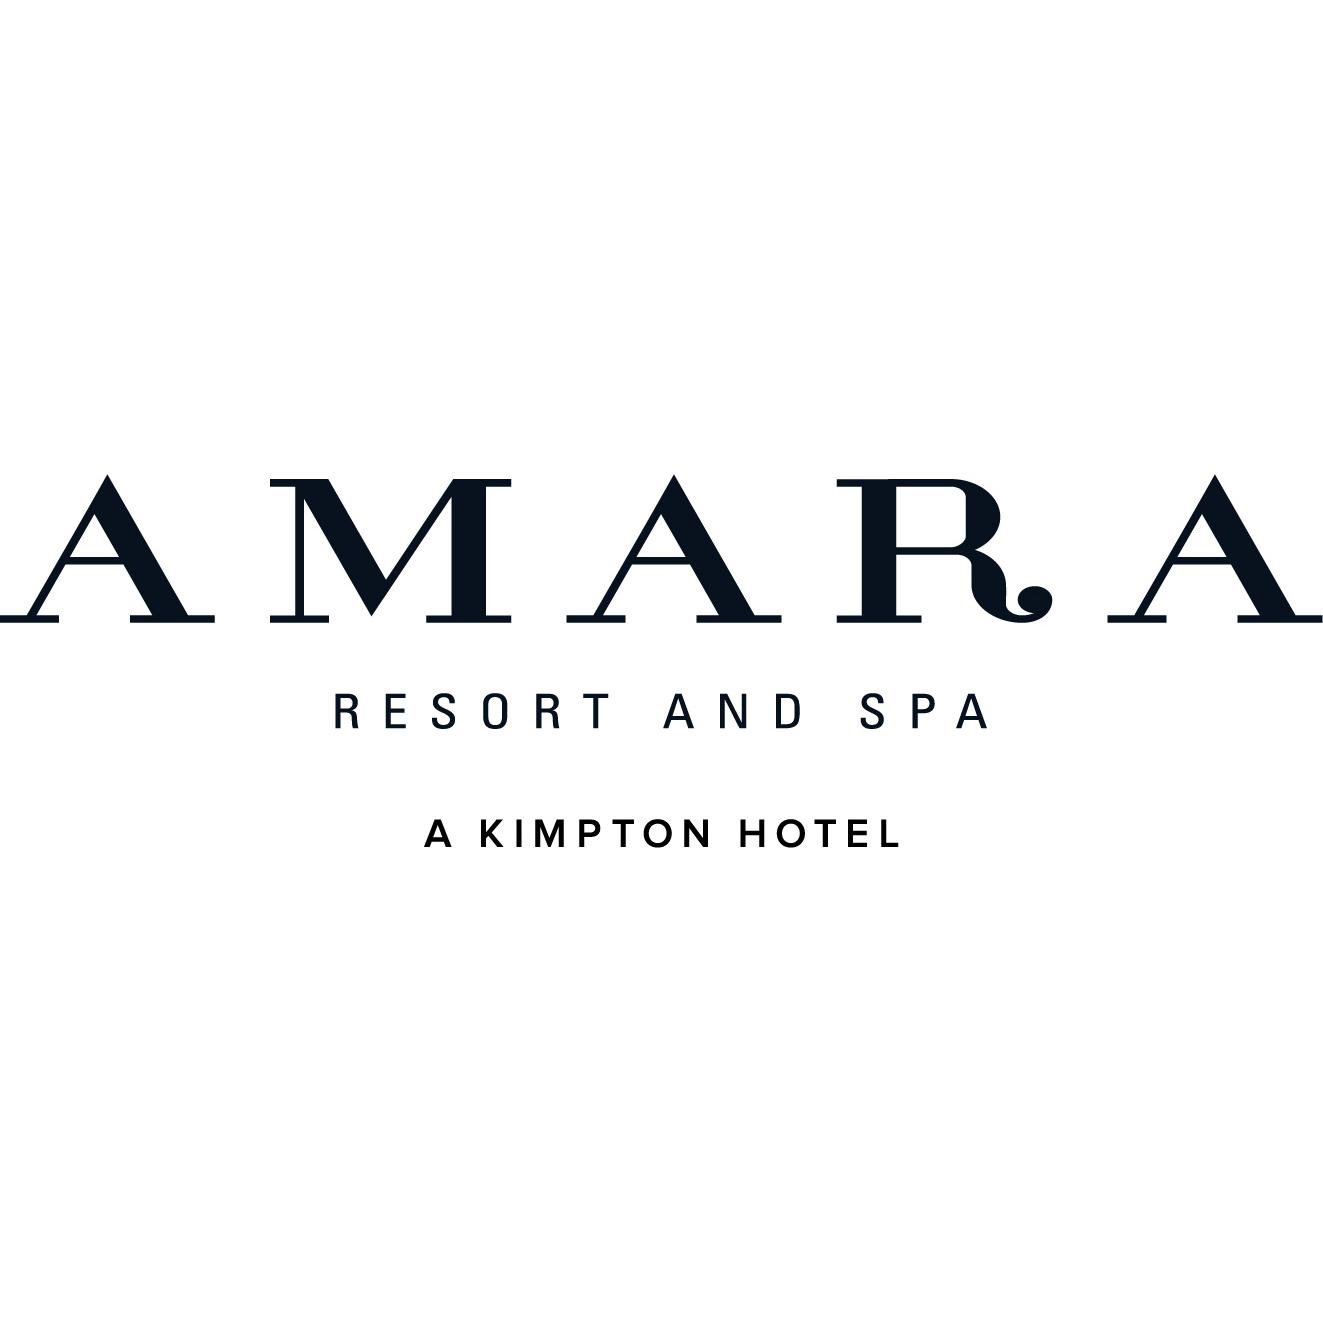 Kimpton amara resort and spa coupons near me in sedona for Hotel spa resort near me